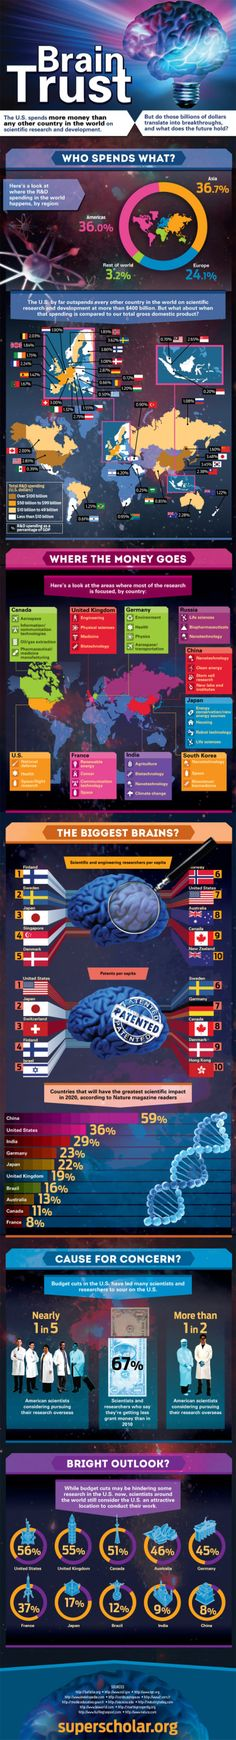 Brain Trust #Infographic #Brain #Research